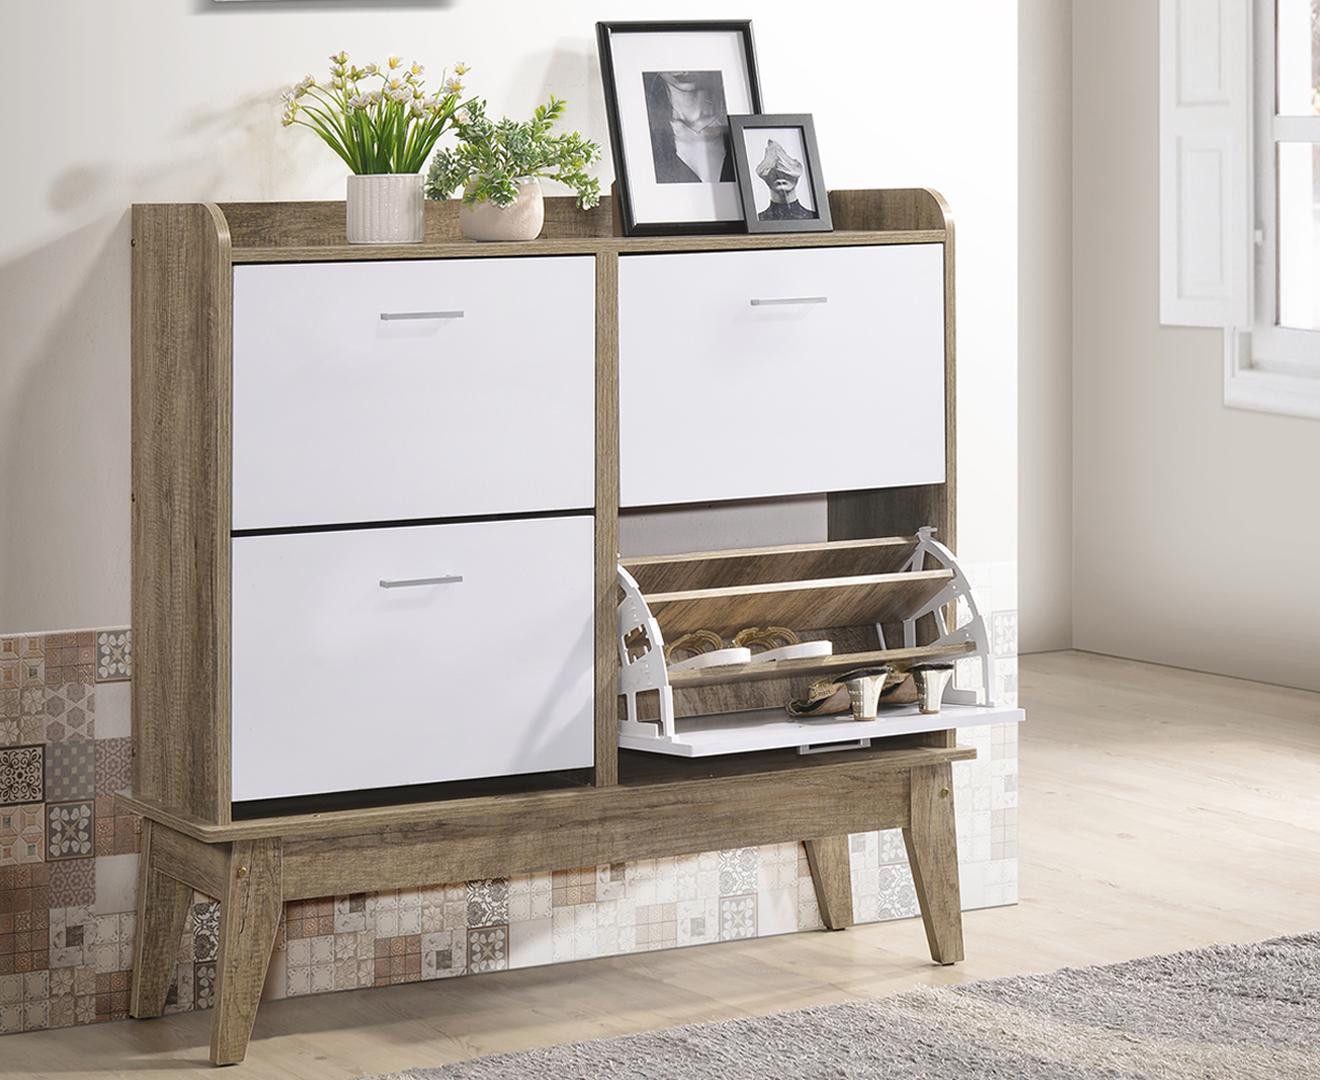 Scandinavian Shoe Cabinet w/ 4 Compartment Drawers Rack Storage Entryway Organizer ⭐E-LIVING Furniture